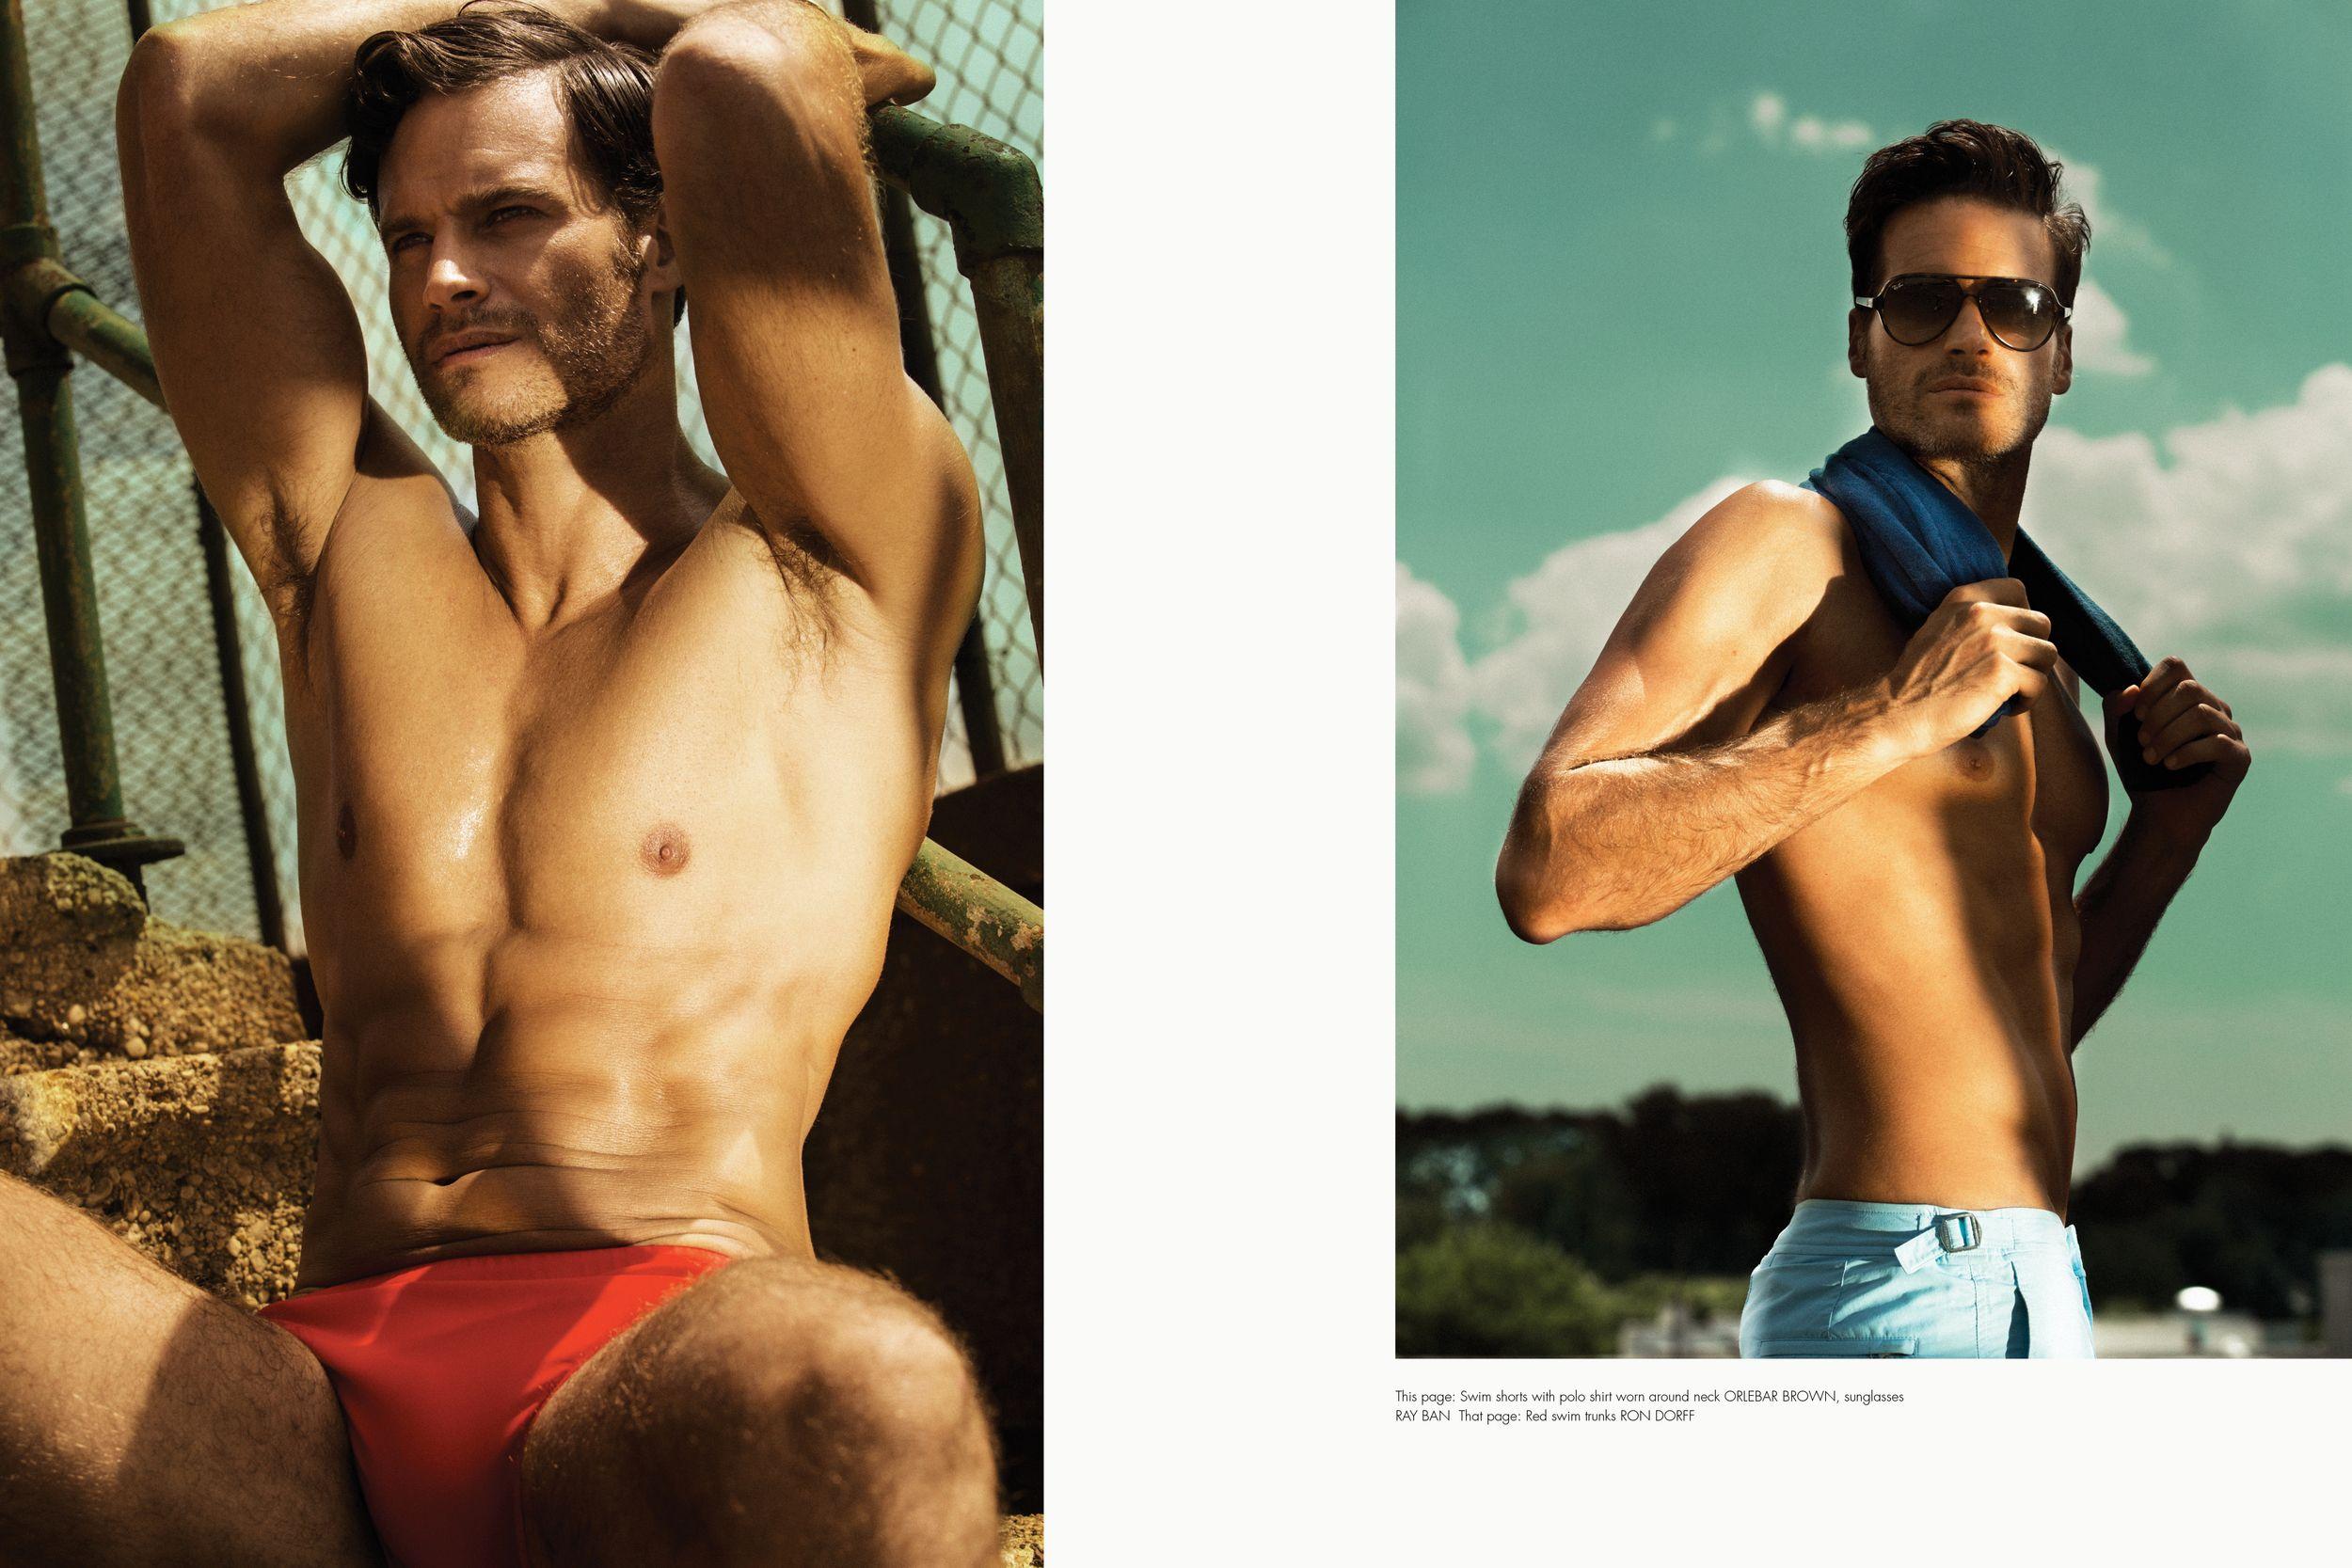 1f011cf320 Red swim trunks RON DORFF, Swim shorts with polo shirt worn around neck ORLEBAR  BROWN, sunglasses RAY BAN